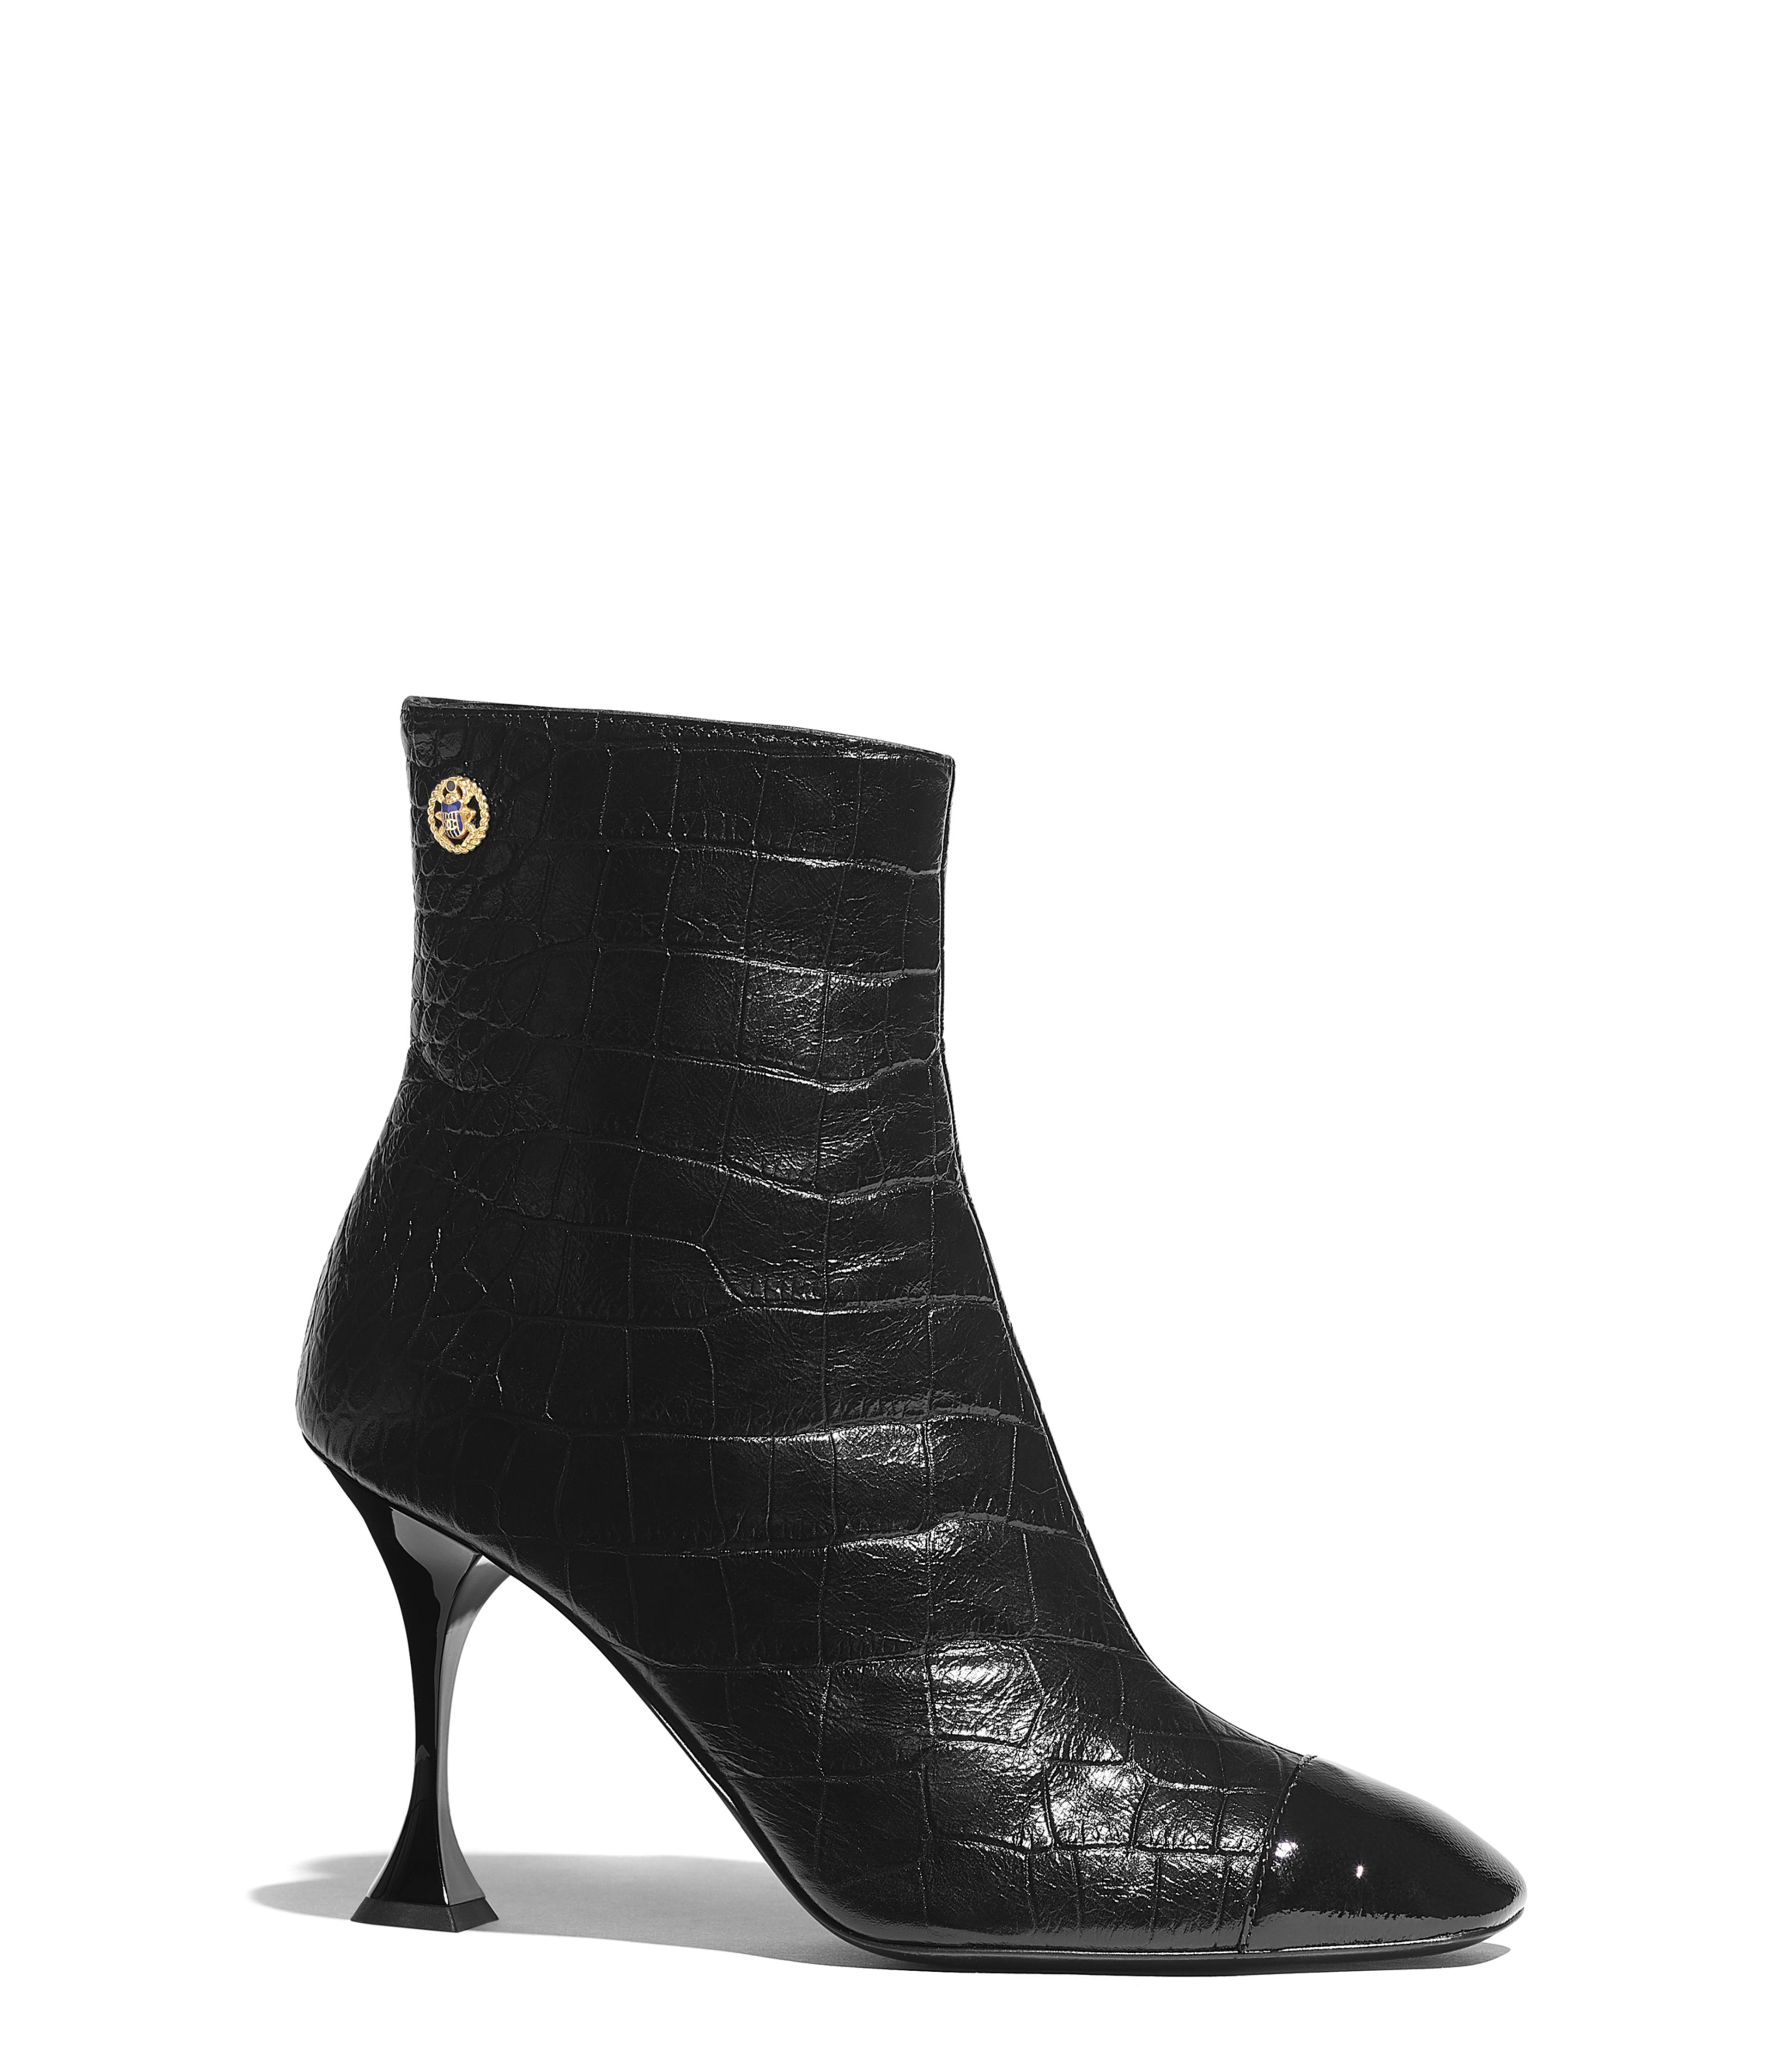 07671817c2 Short Boots Embossed Matte Calfskin & Patent Crumpled Lambskin, Black Ref.  G34903Y5337794305